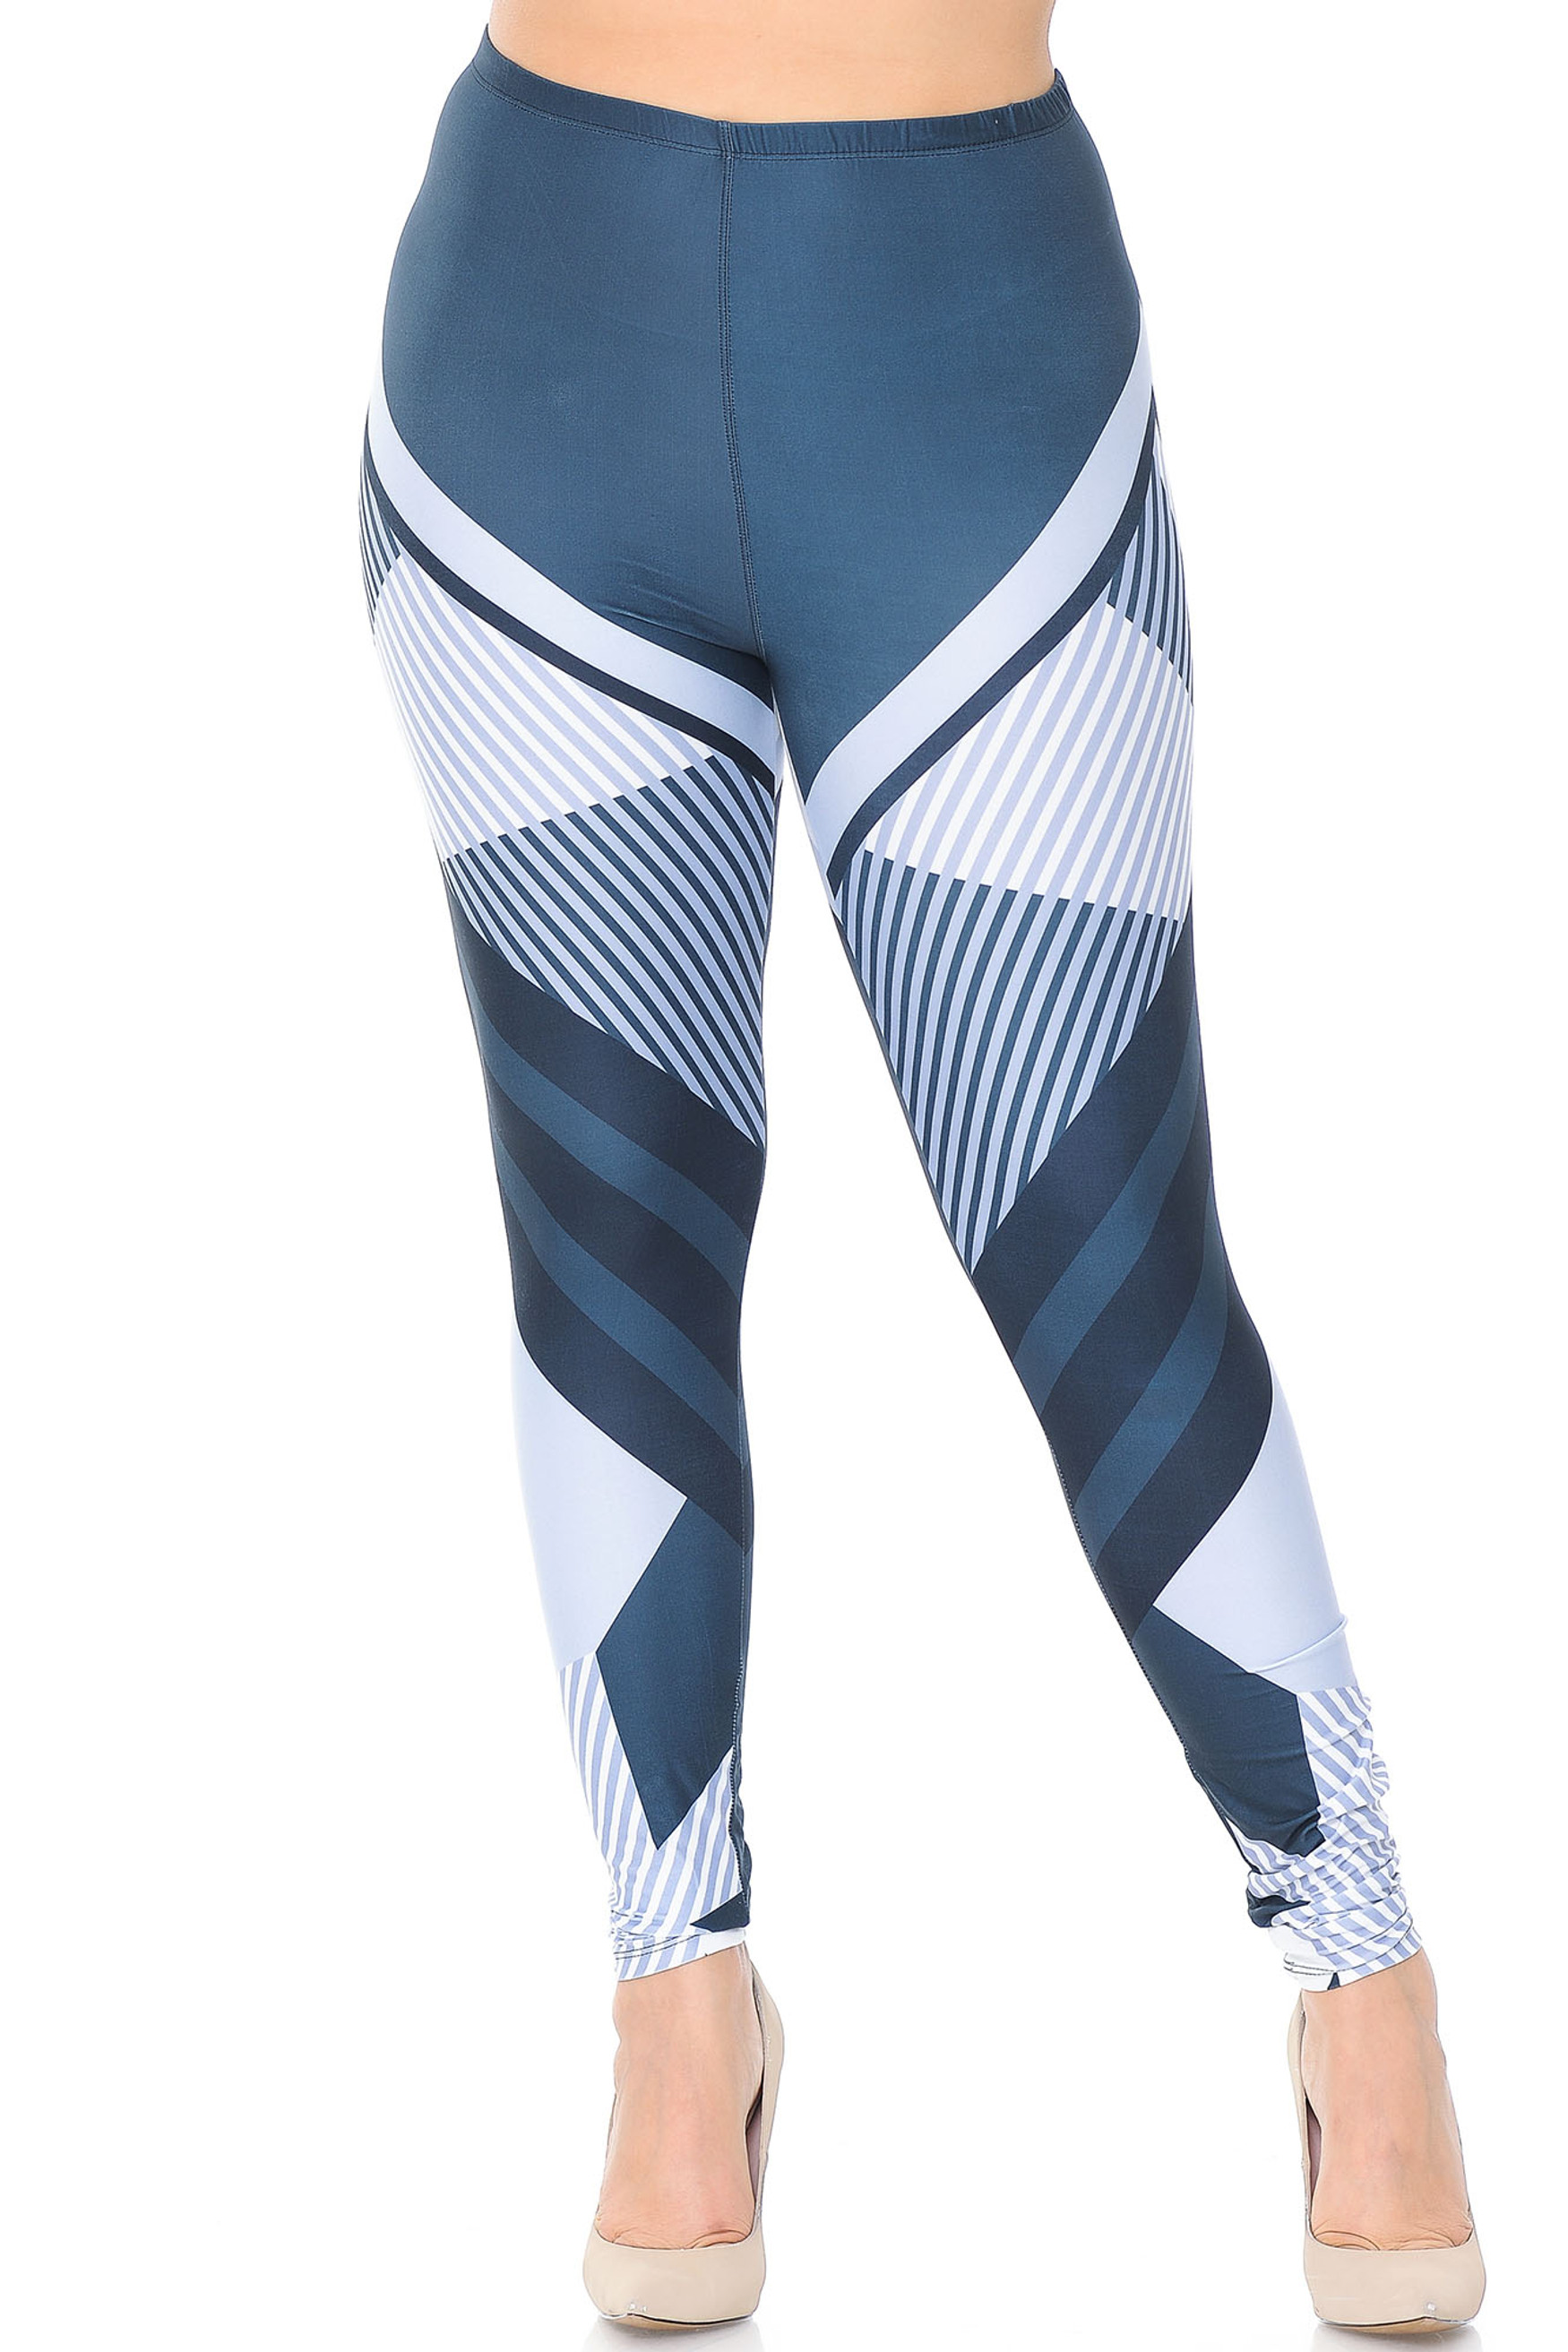 Creamy Soft Contour Angles Extra Plus Size Leggings - 3X-5X - USA Fashion™